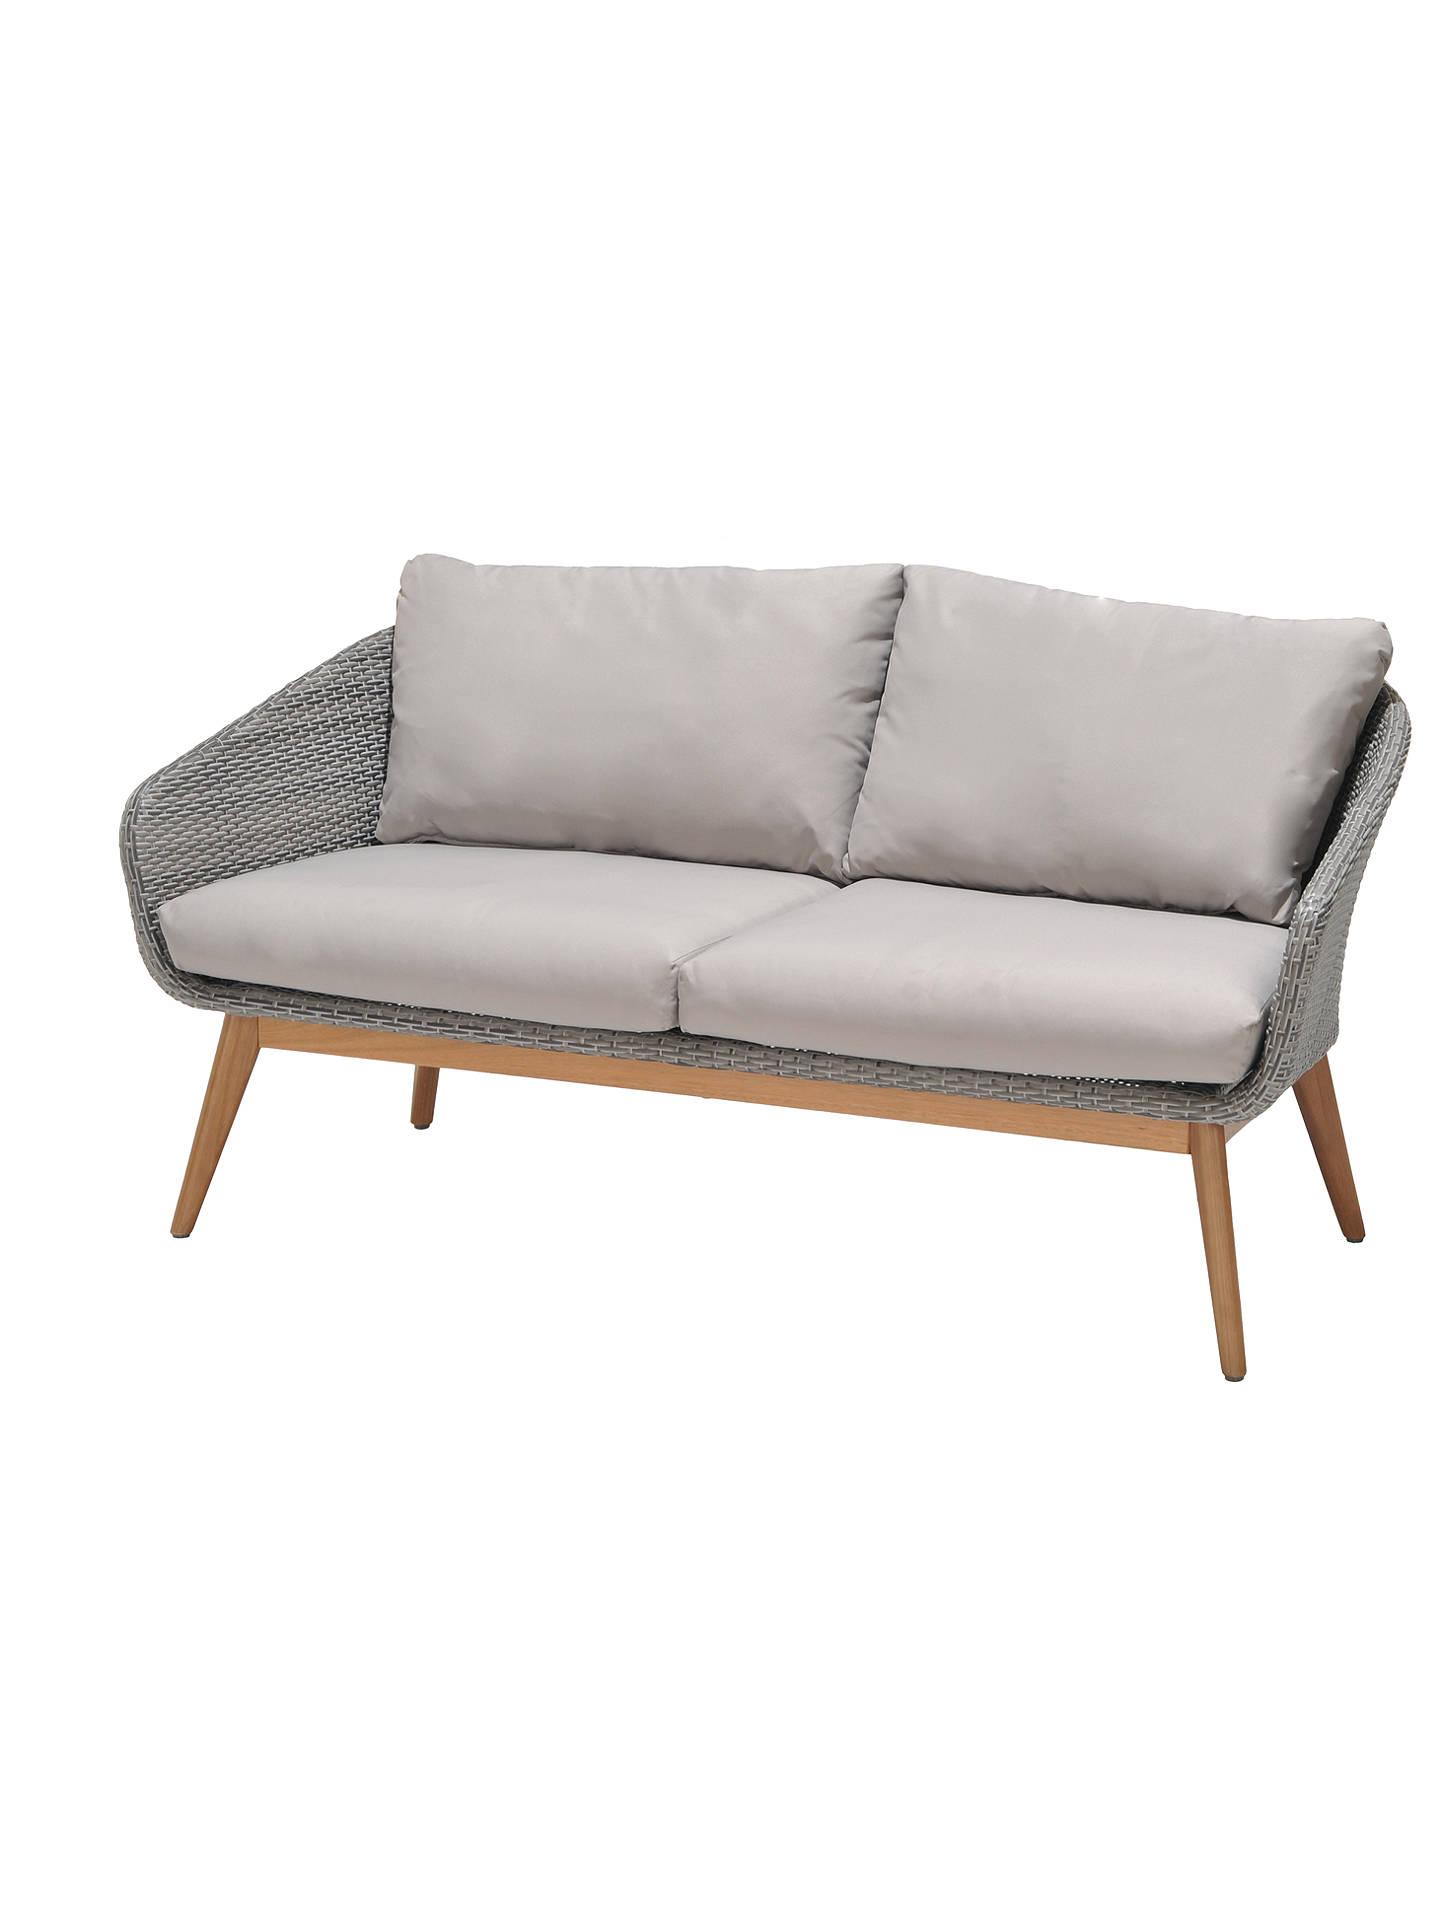 John Lewis Partners Bergen 2 Seater Garden Sofa Fsc Certified Eucalyptus Grey